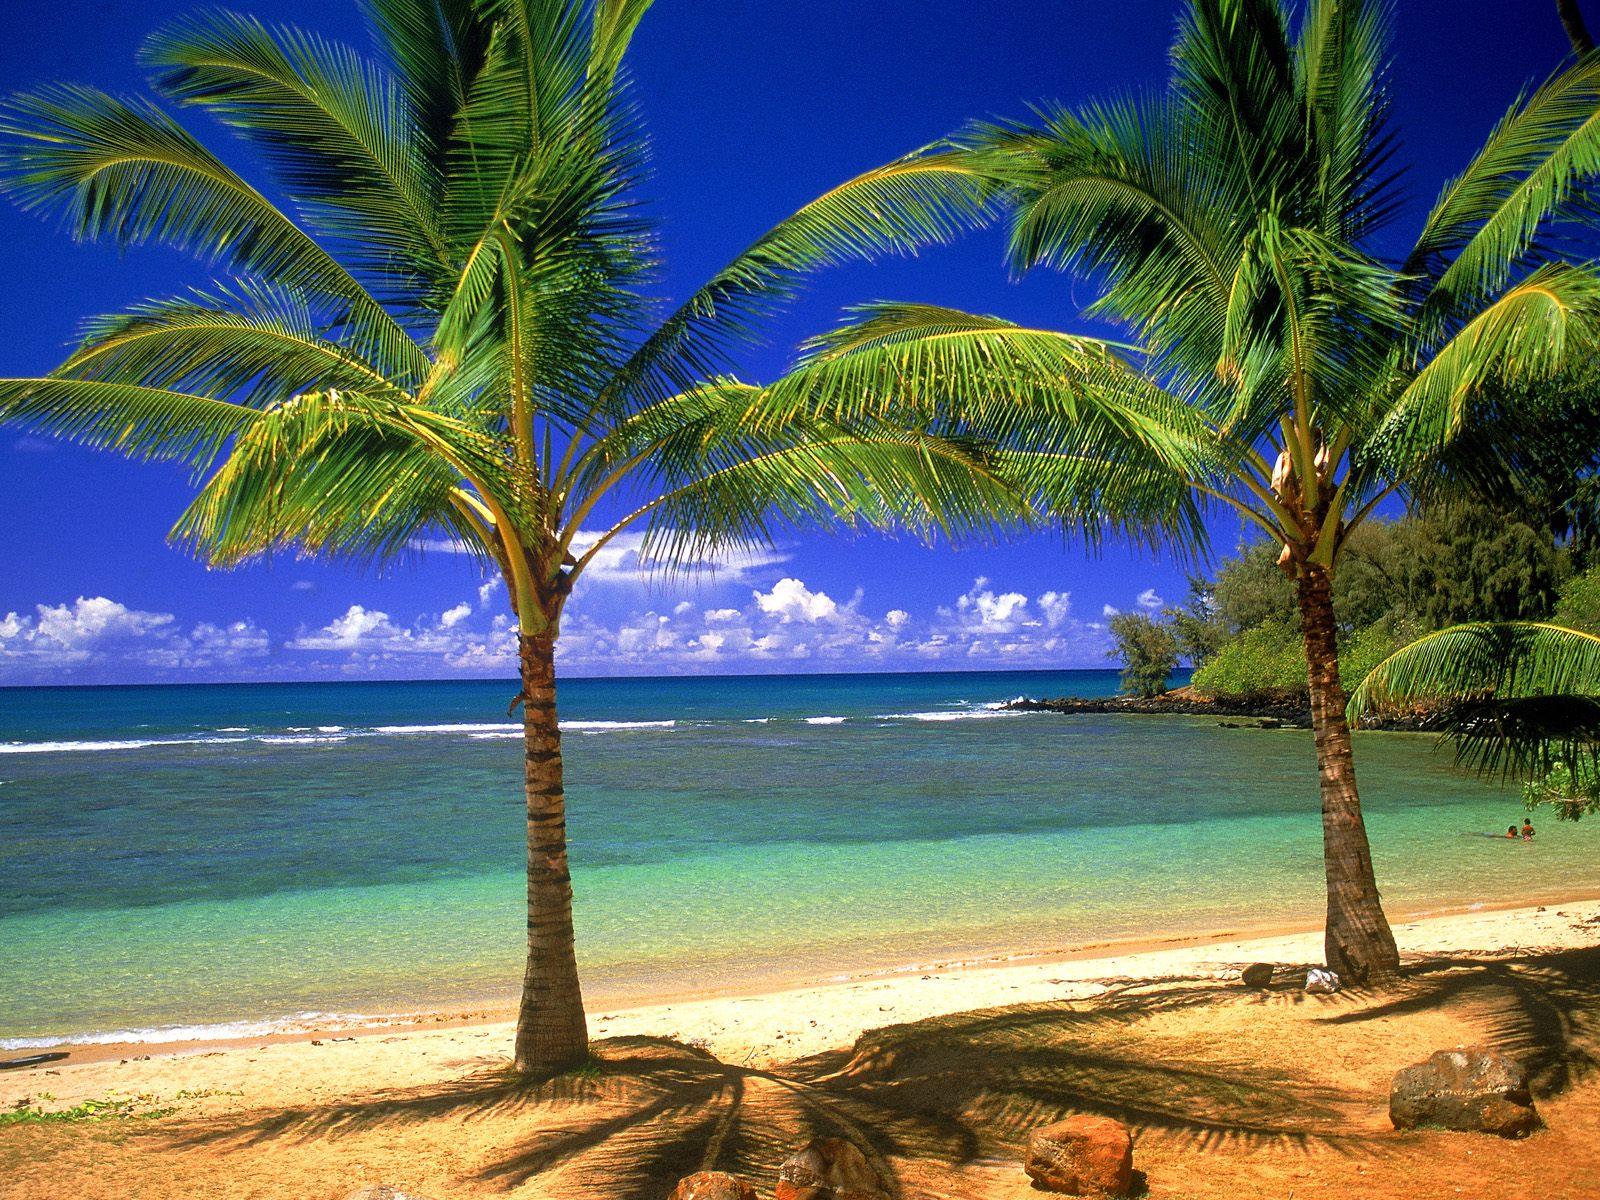 Tropical Lagoon Wallpapers   HD Wallpapers